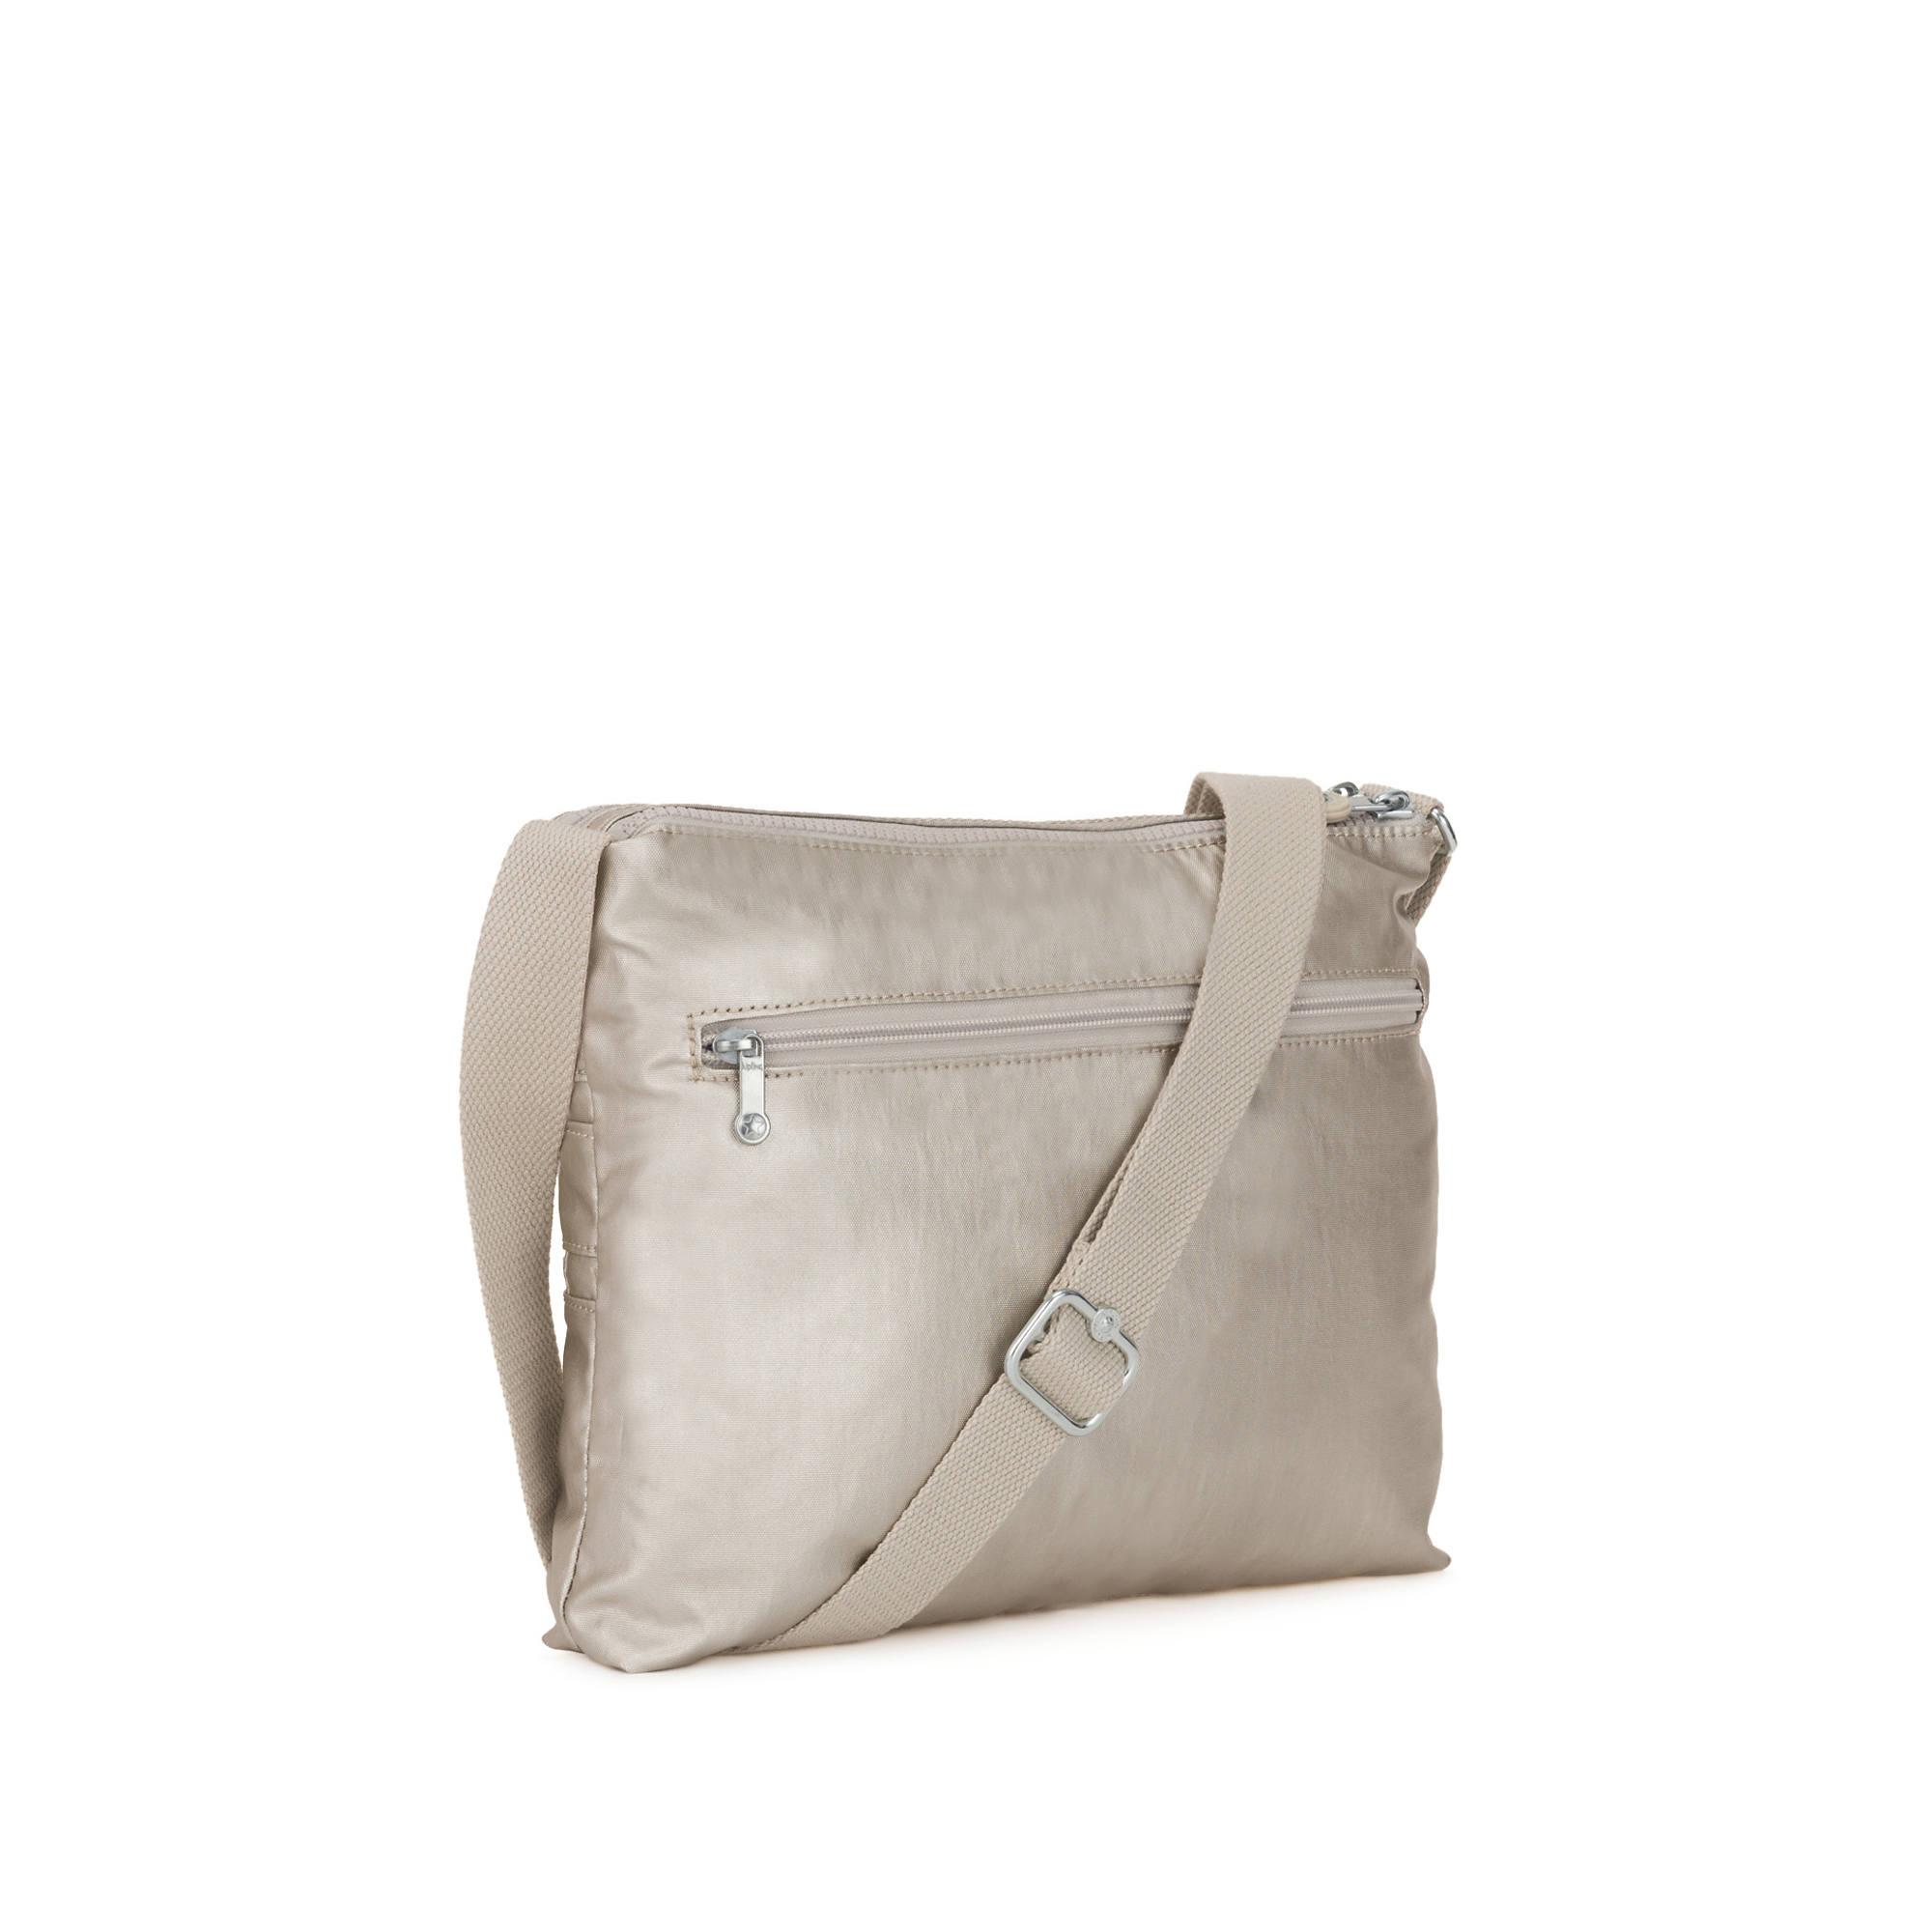 Kipling-Alvar-Metallic-Crossbody-Bag miniature 14